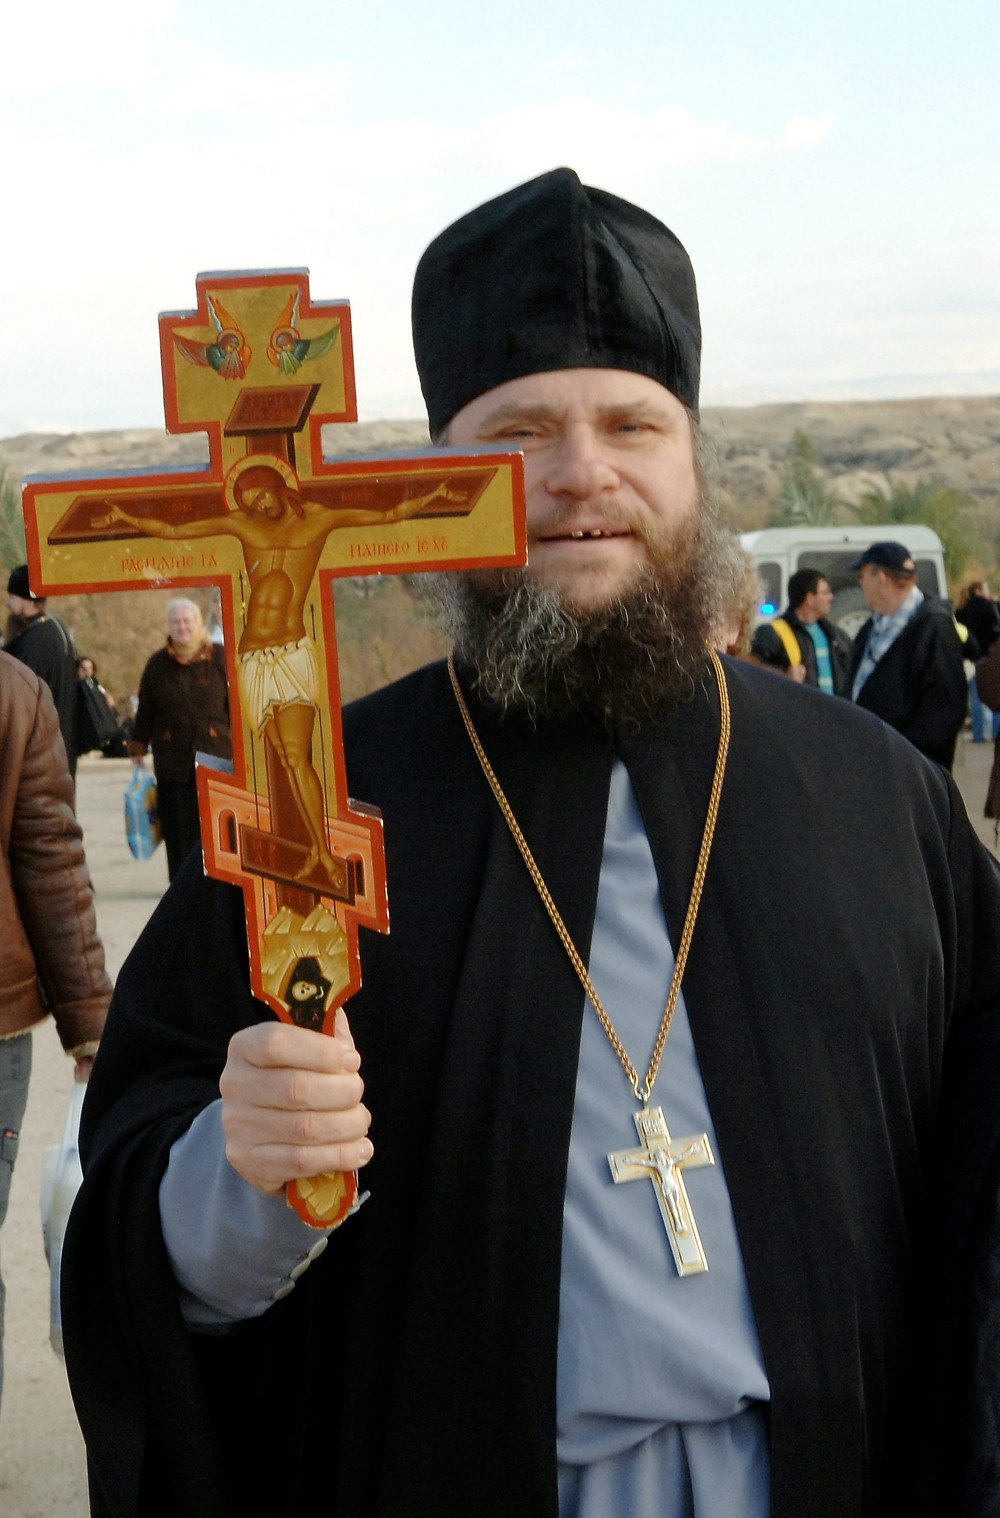 Illustration: Christian Orthodox Priest (Image credit: Milner Moshe/Government Press Office of Israel)